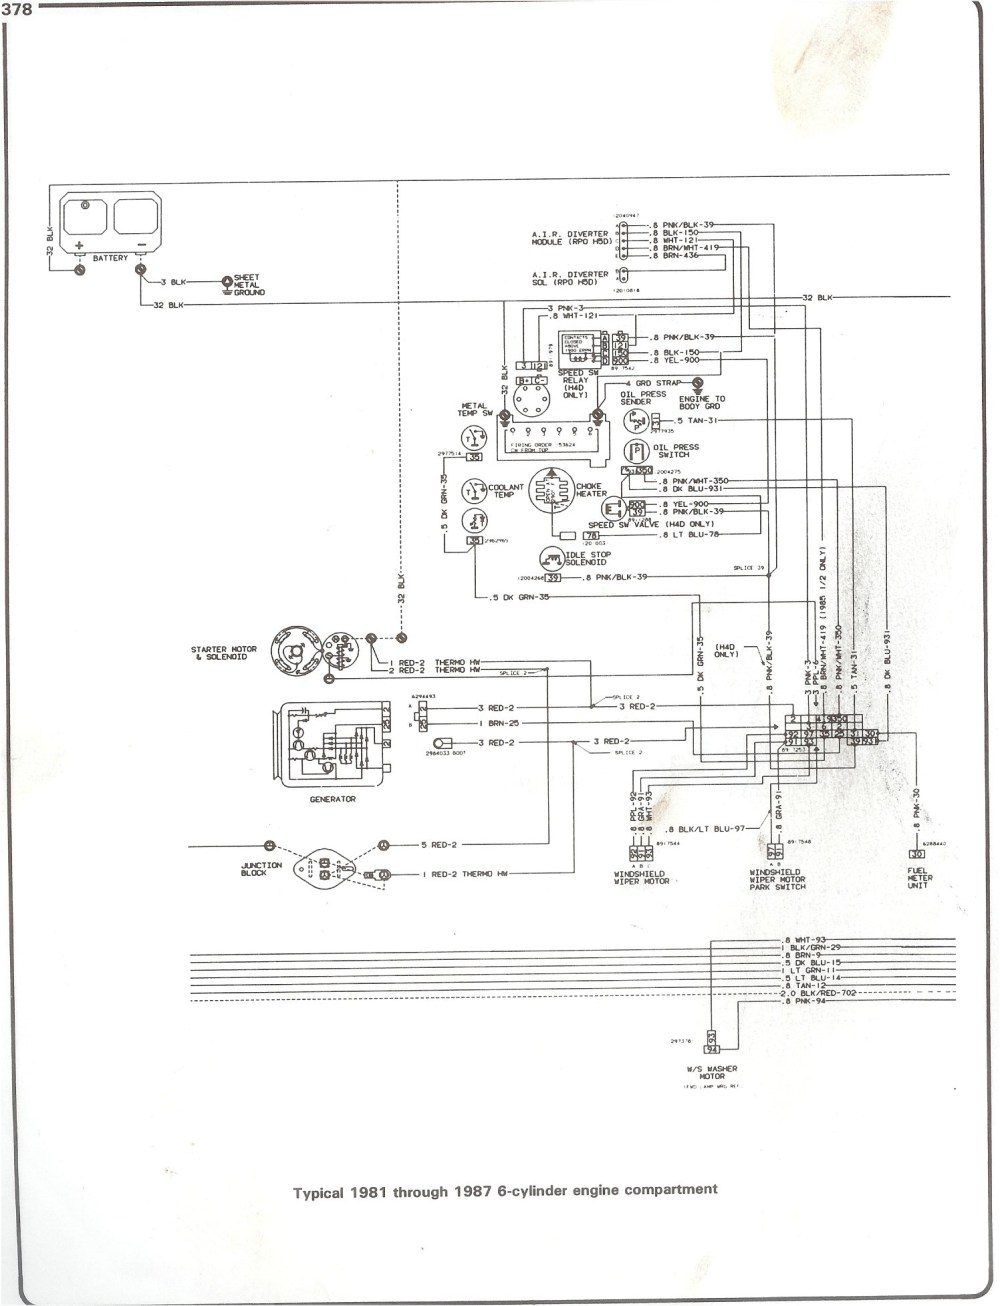 medium resolution of 2002 chevy tracker fuel gauge wiring wiring diagram advance 2002 chevy tracker fuel gauge wiring